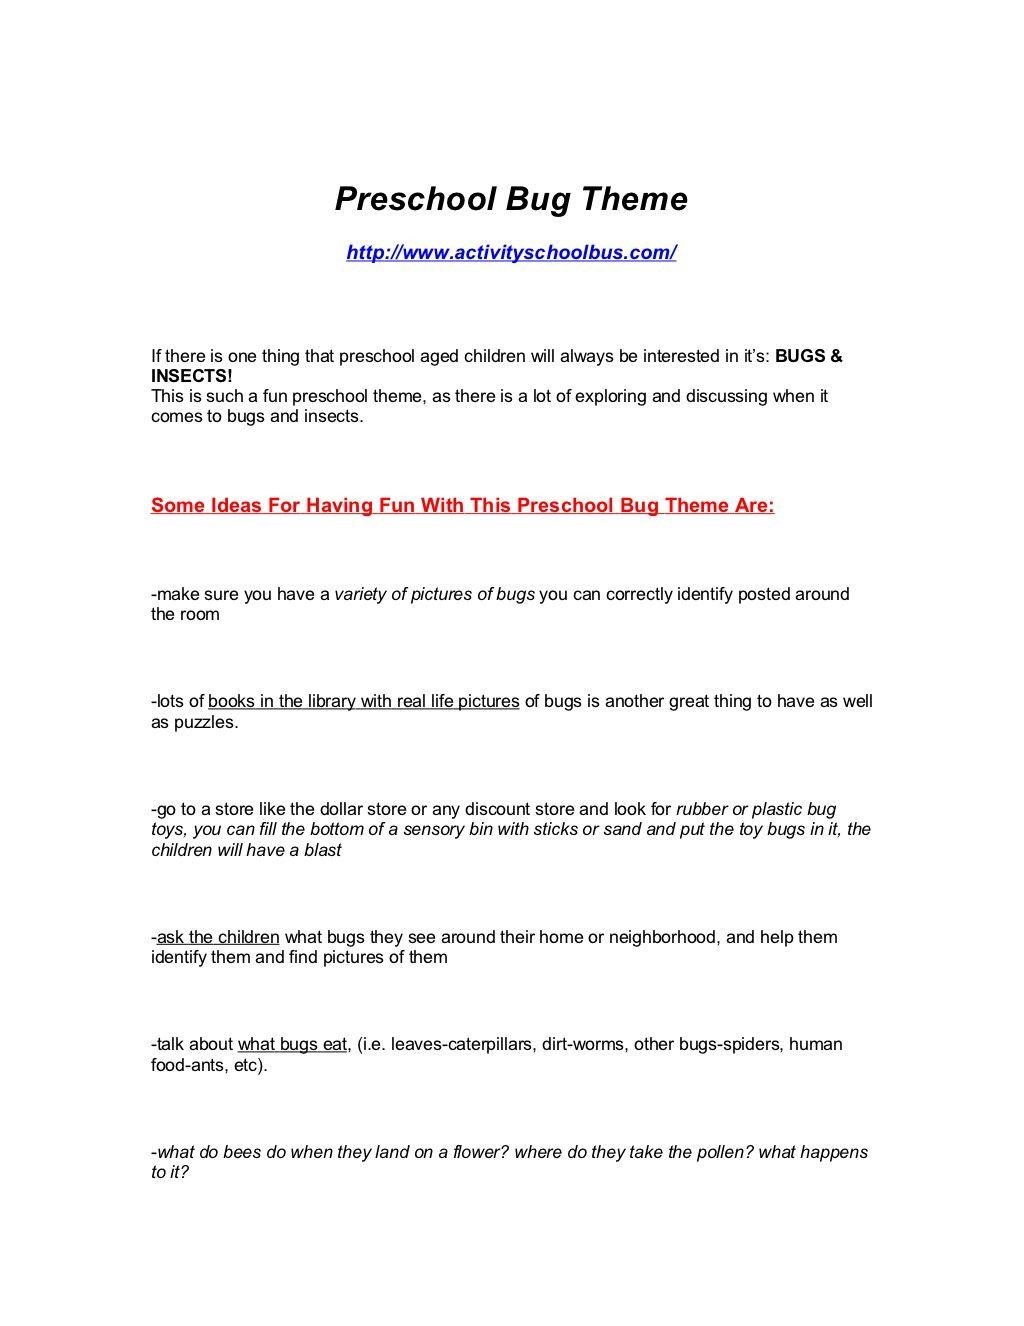 Pre K Bug Insect Theme For Preschoolers By Dane Robinson Via Slideshare